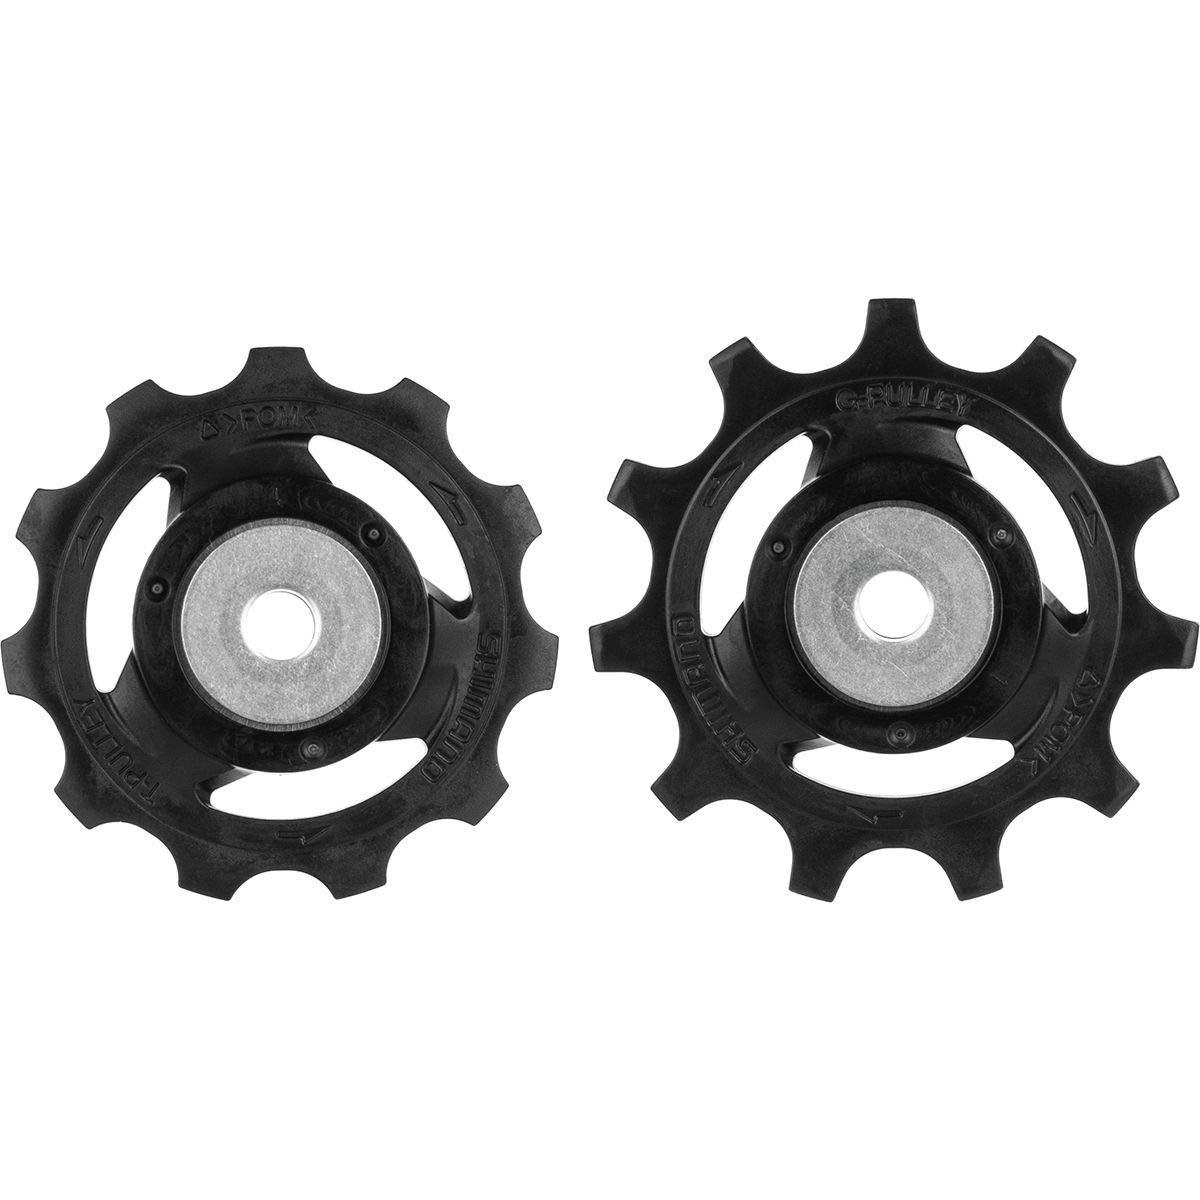 SHIMANO Ultegra 11 Speed Road Pulley Wheel Kit Black, Ultegra RD-R8000 by SHIMANO